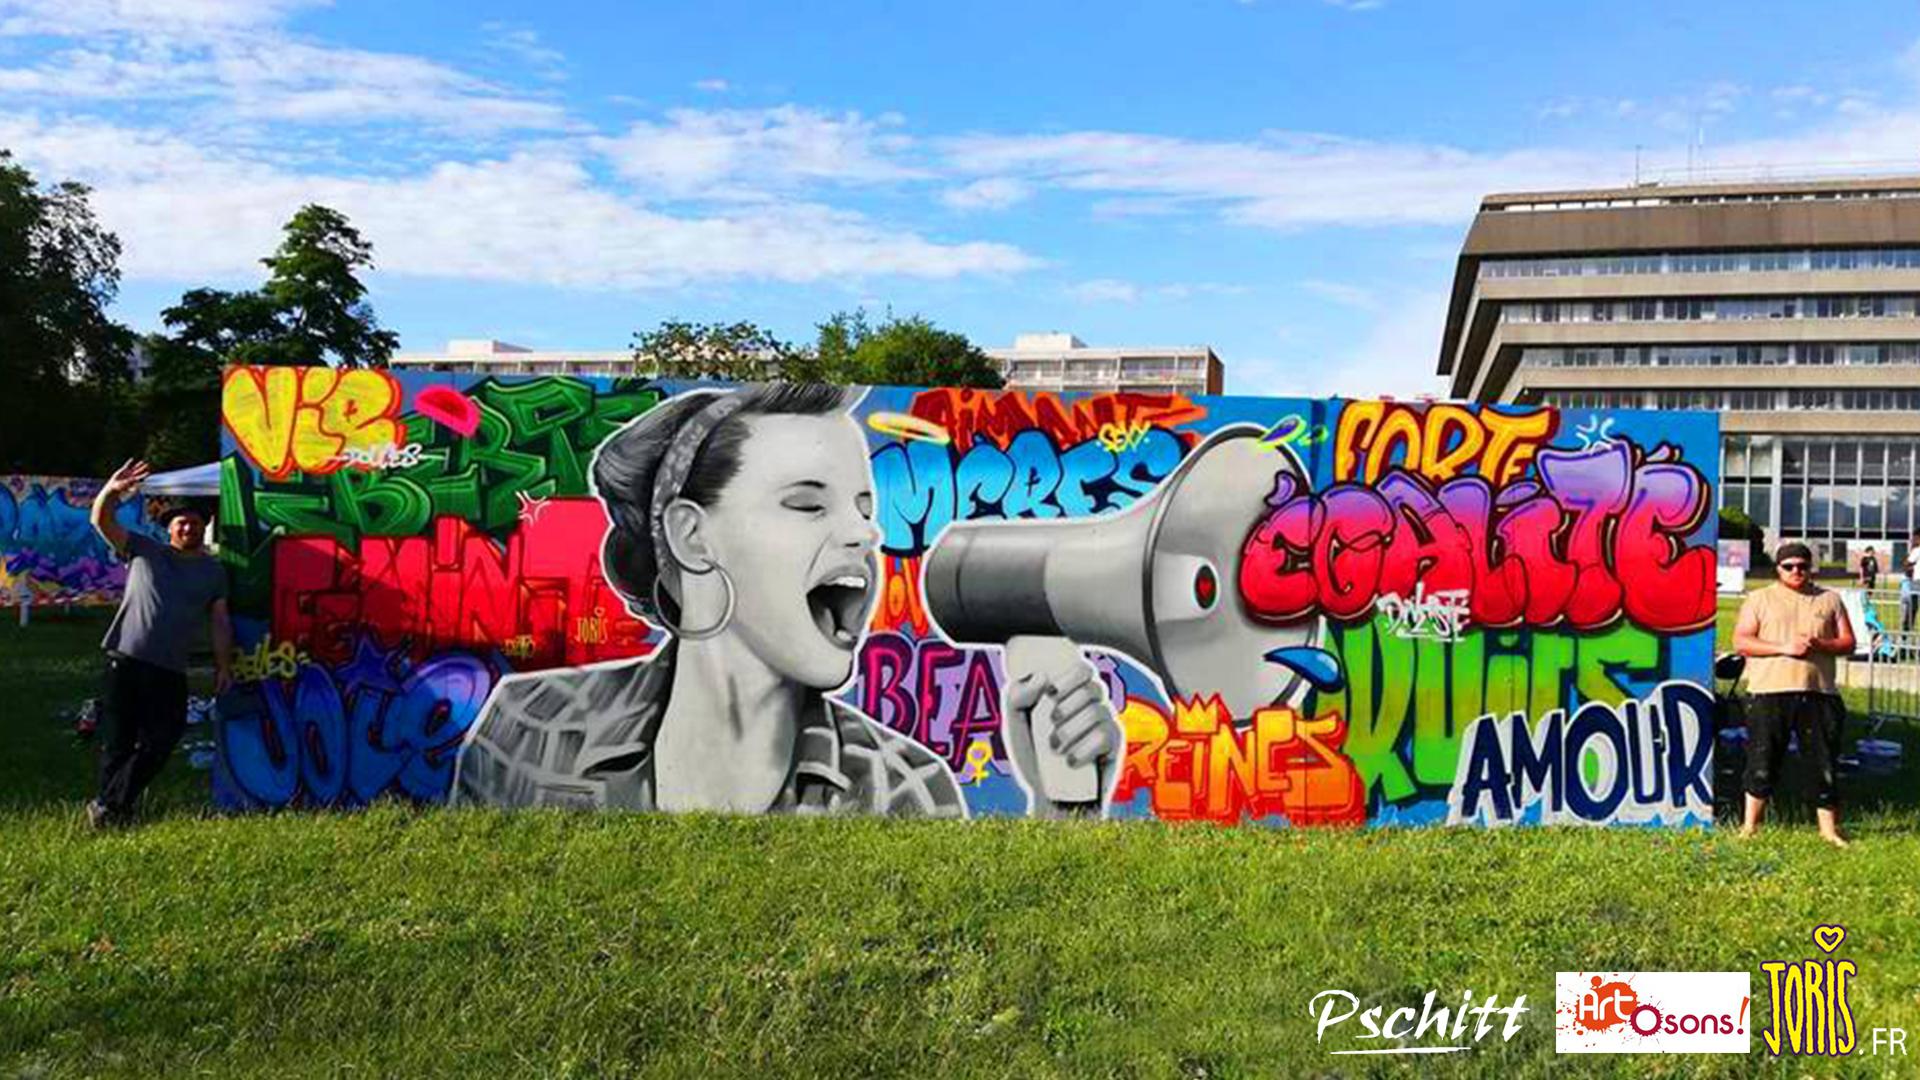 DECORATION-GRAFFITI-FRESQUE-TABLEAU-STREET-ART-PARIS-18